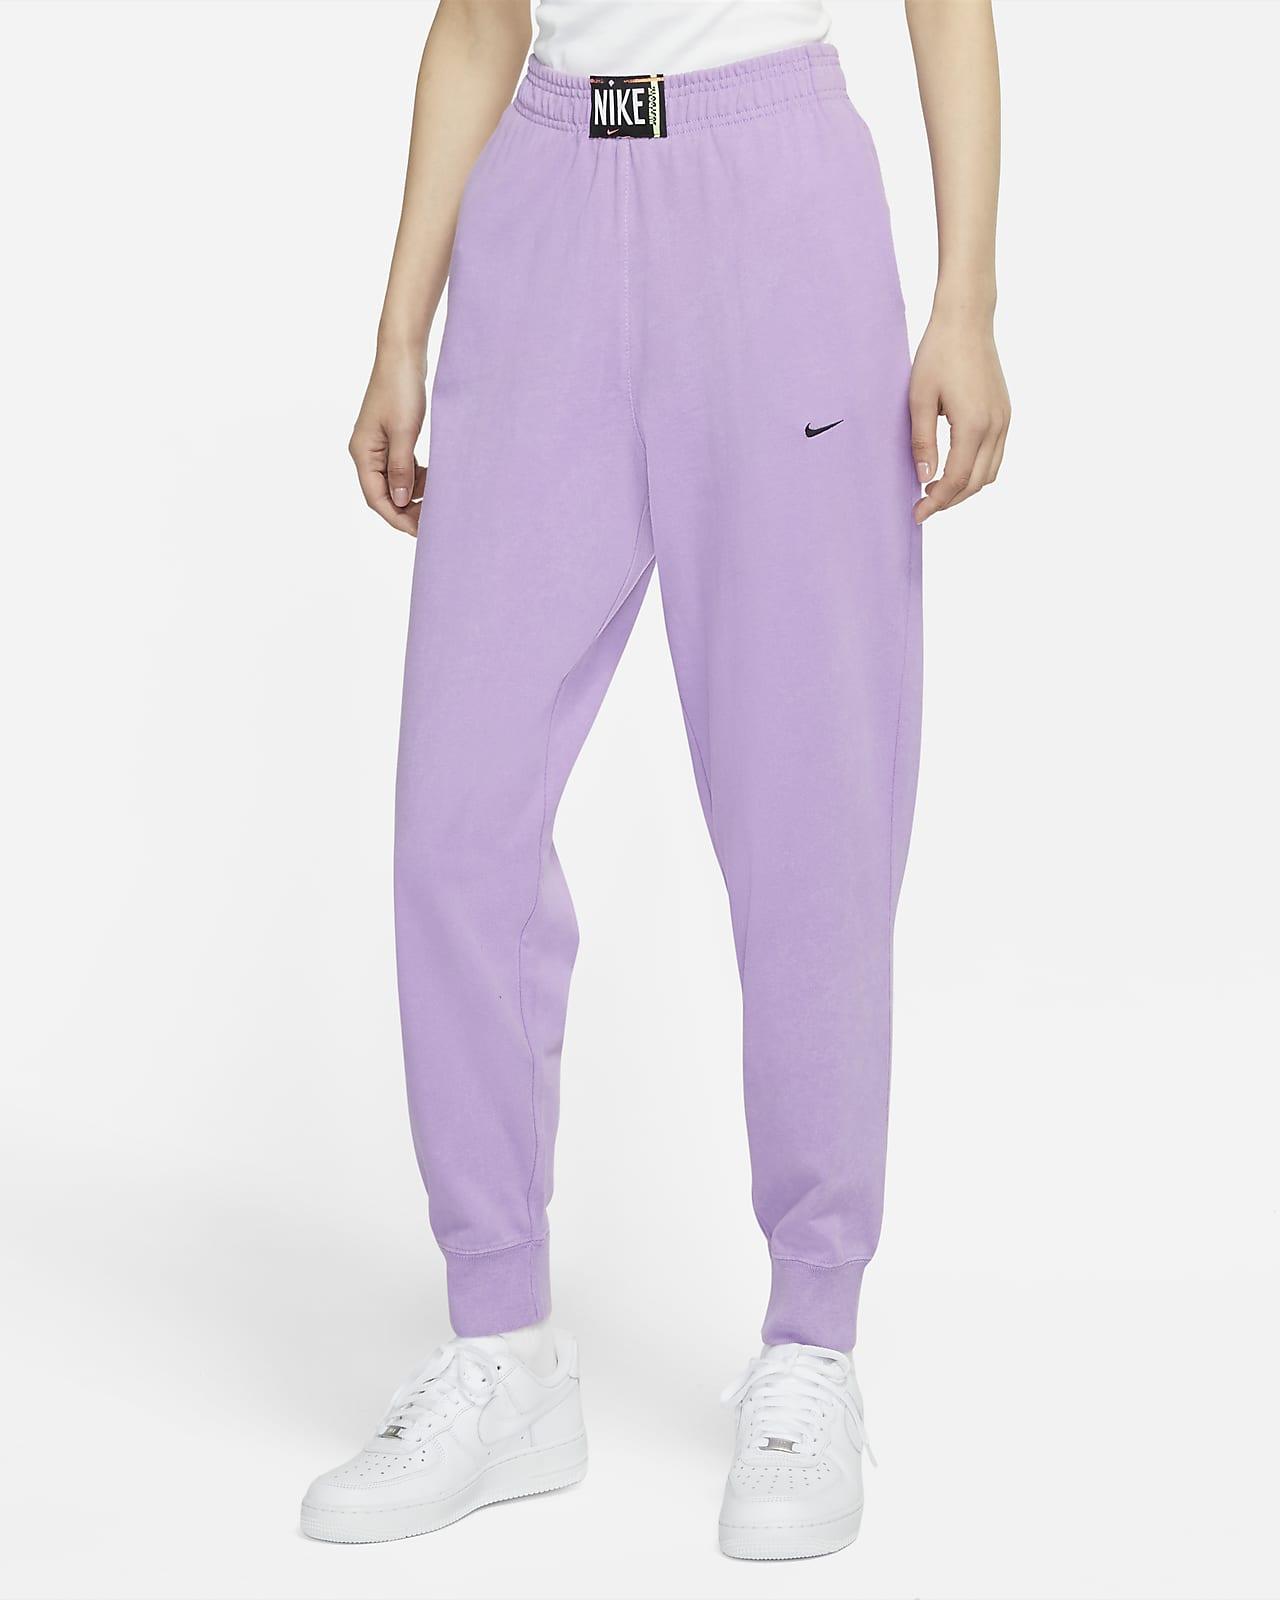 Nike Sportswear Washed 女子长裤